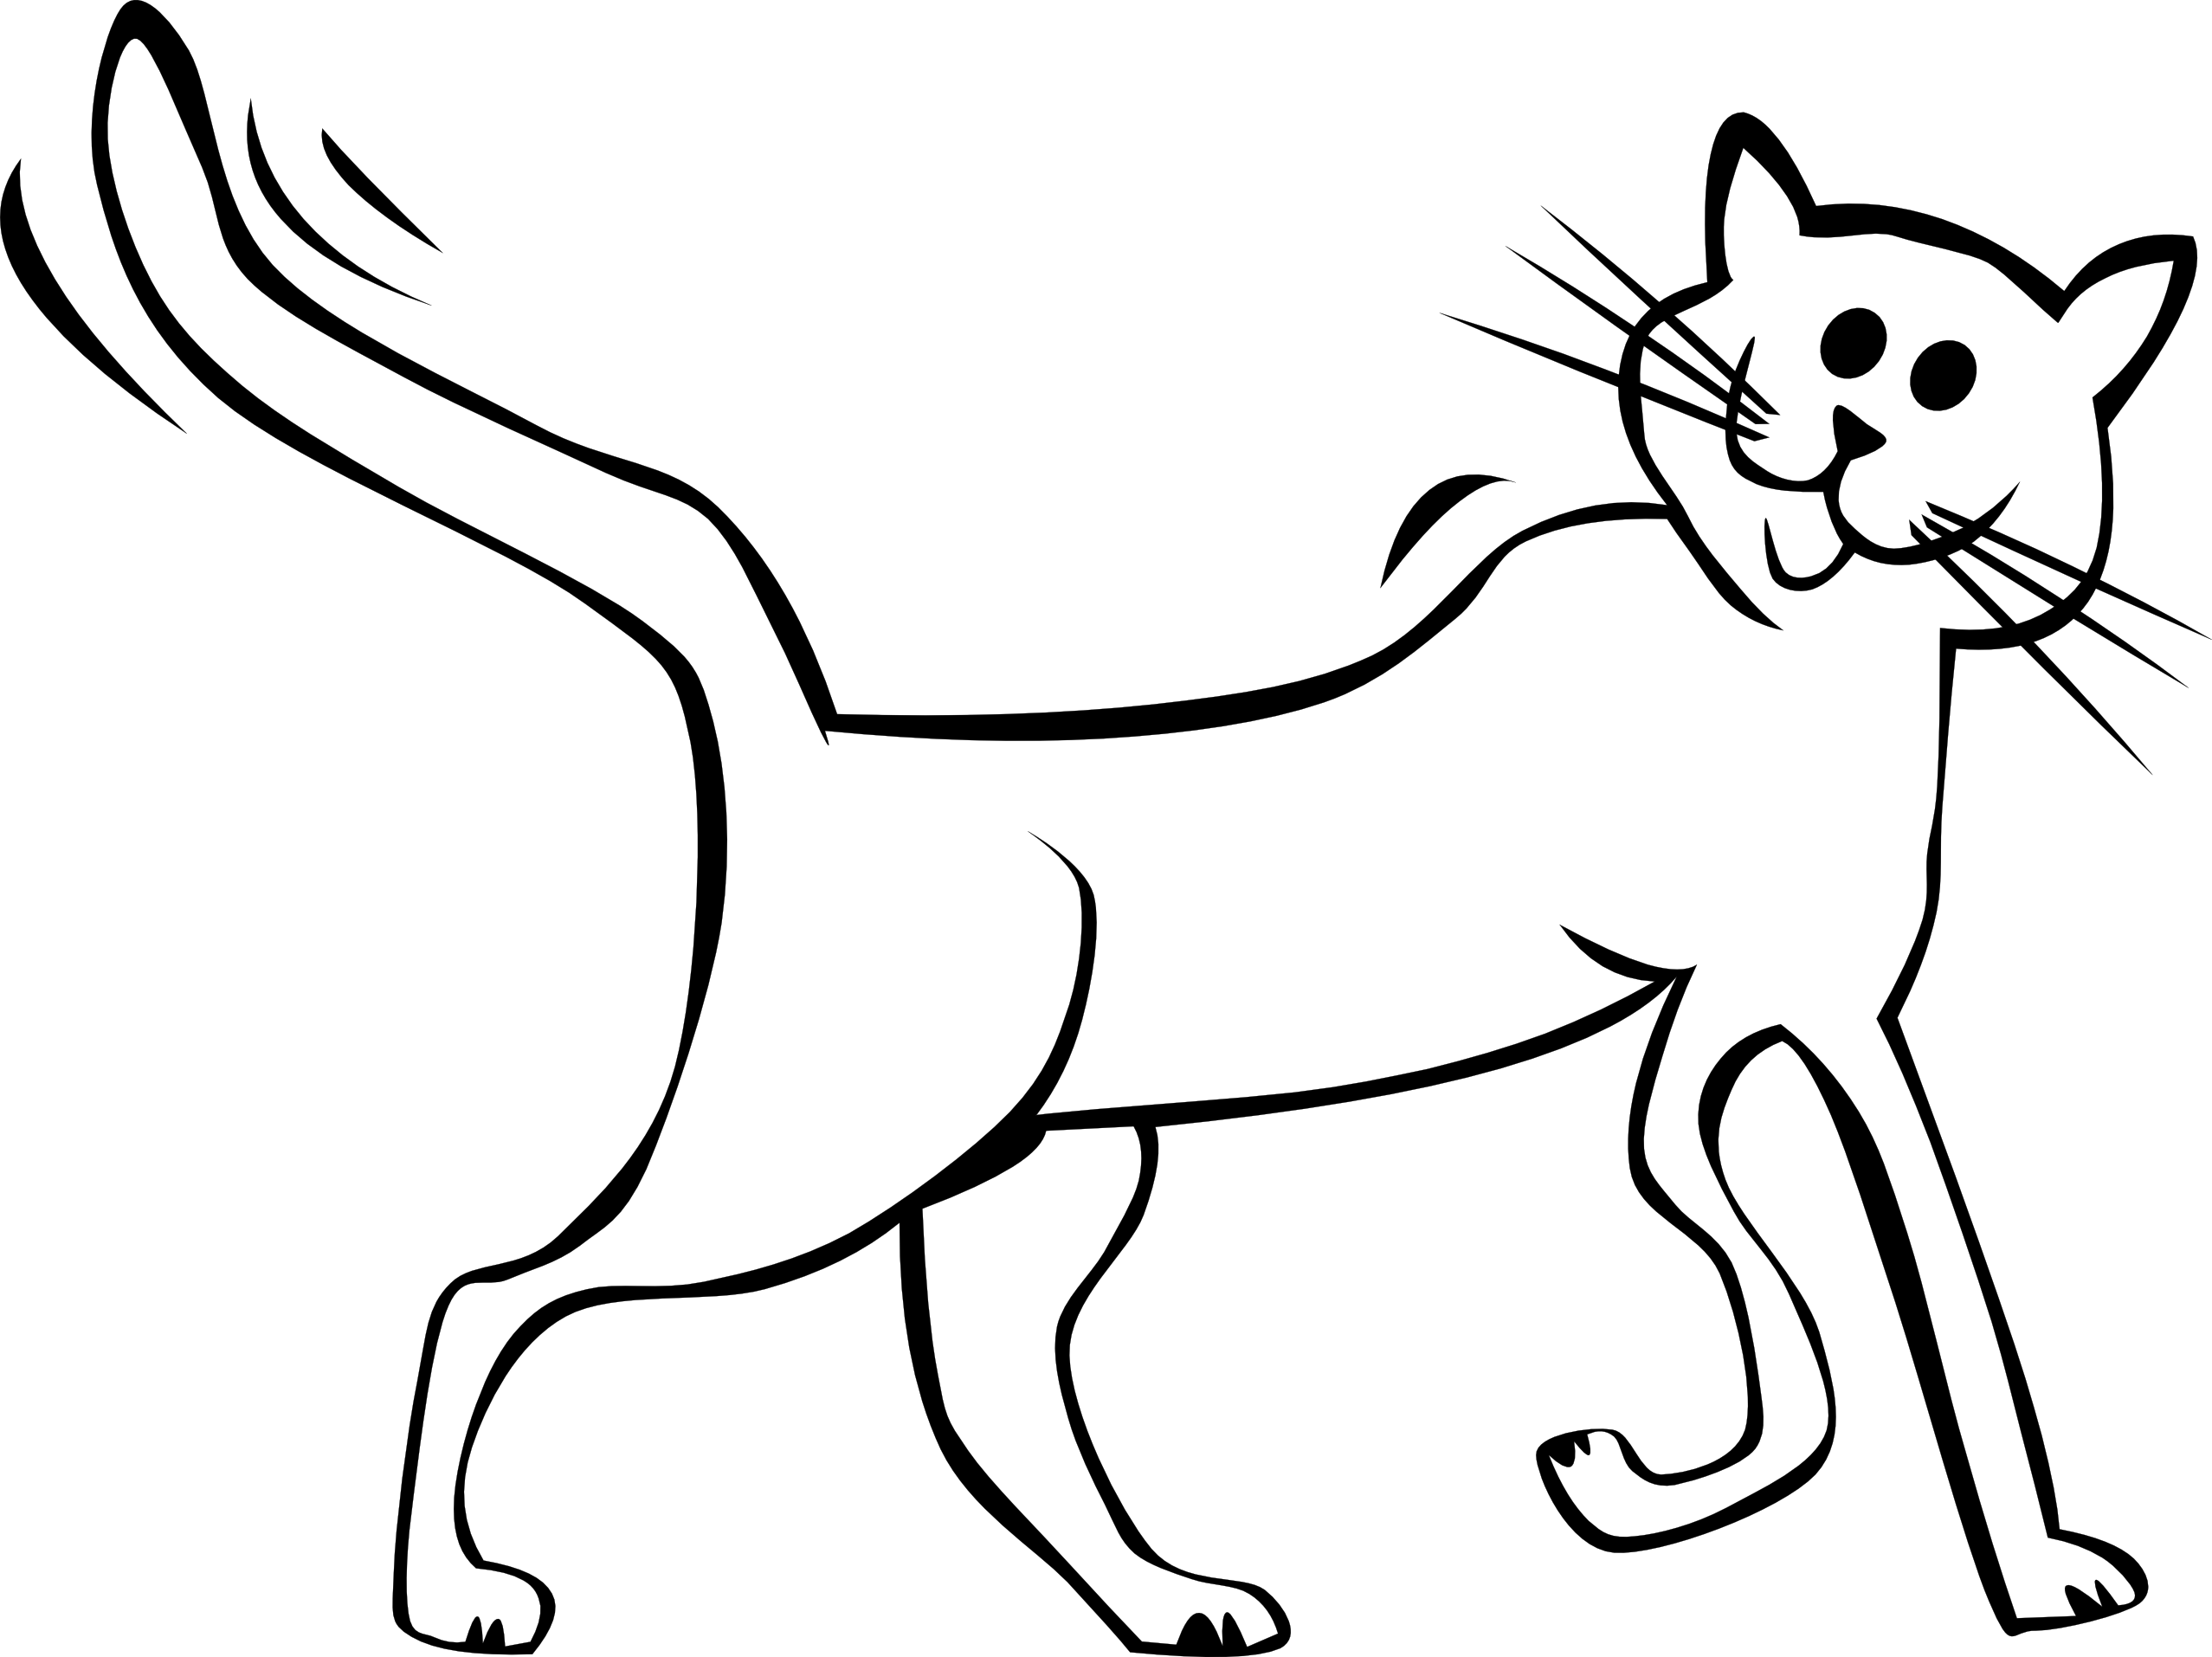 Line Drawing Kitten : Cat line drawings clipart best